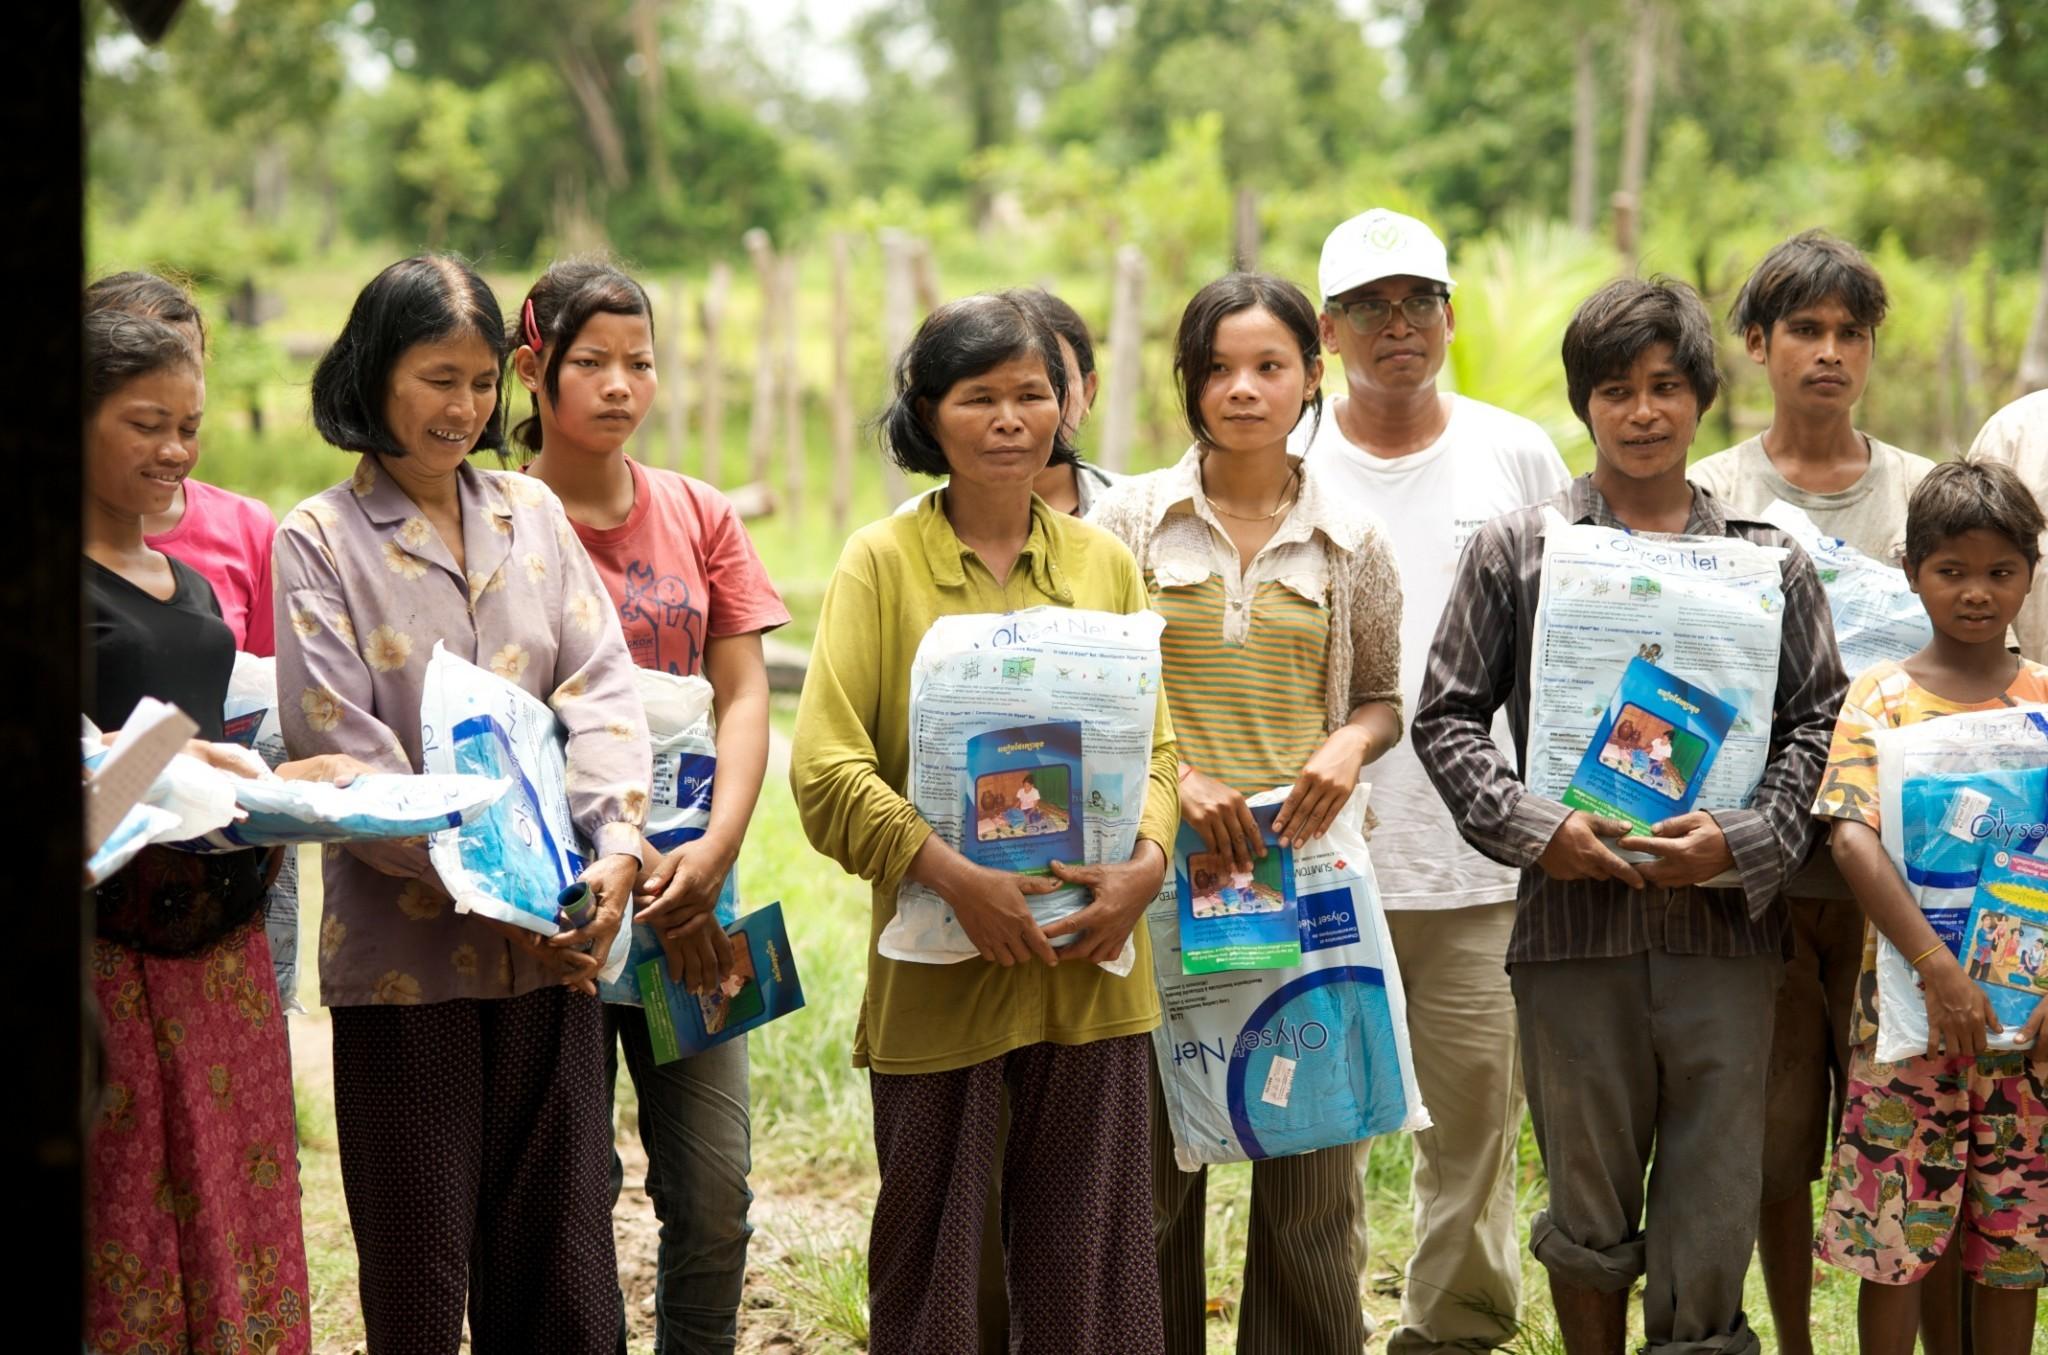 AlexSoh_July09 Cambodia157